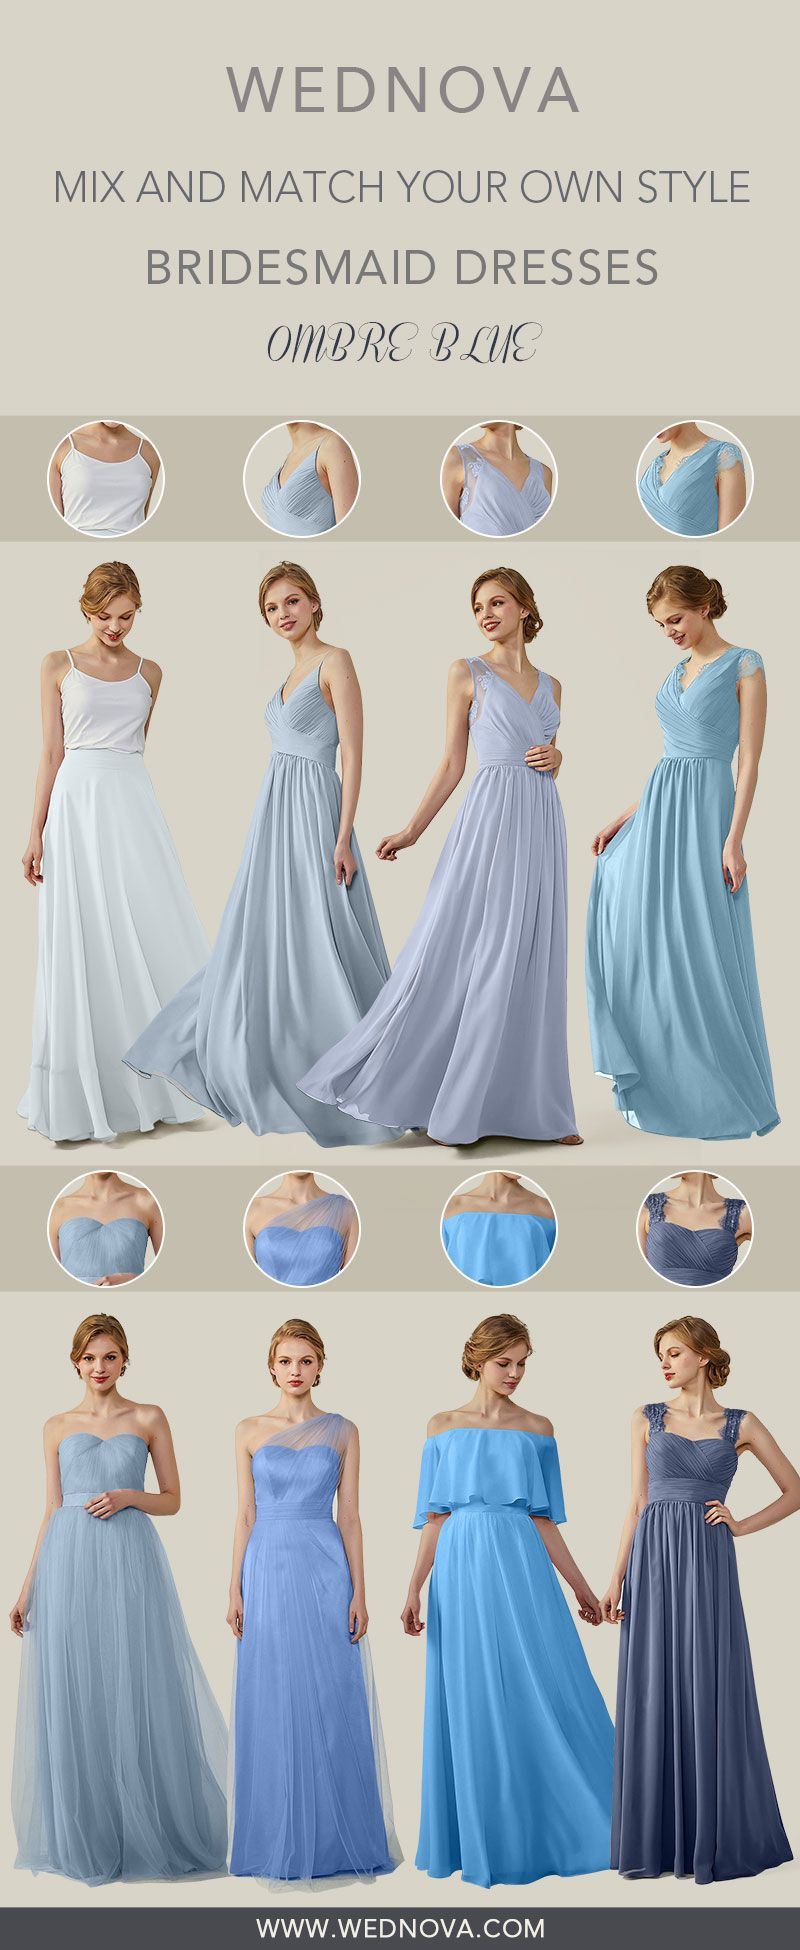 Ombre blue chiffon bridesmaid dresses one shoulder tulle dress v